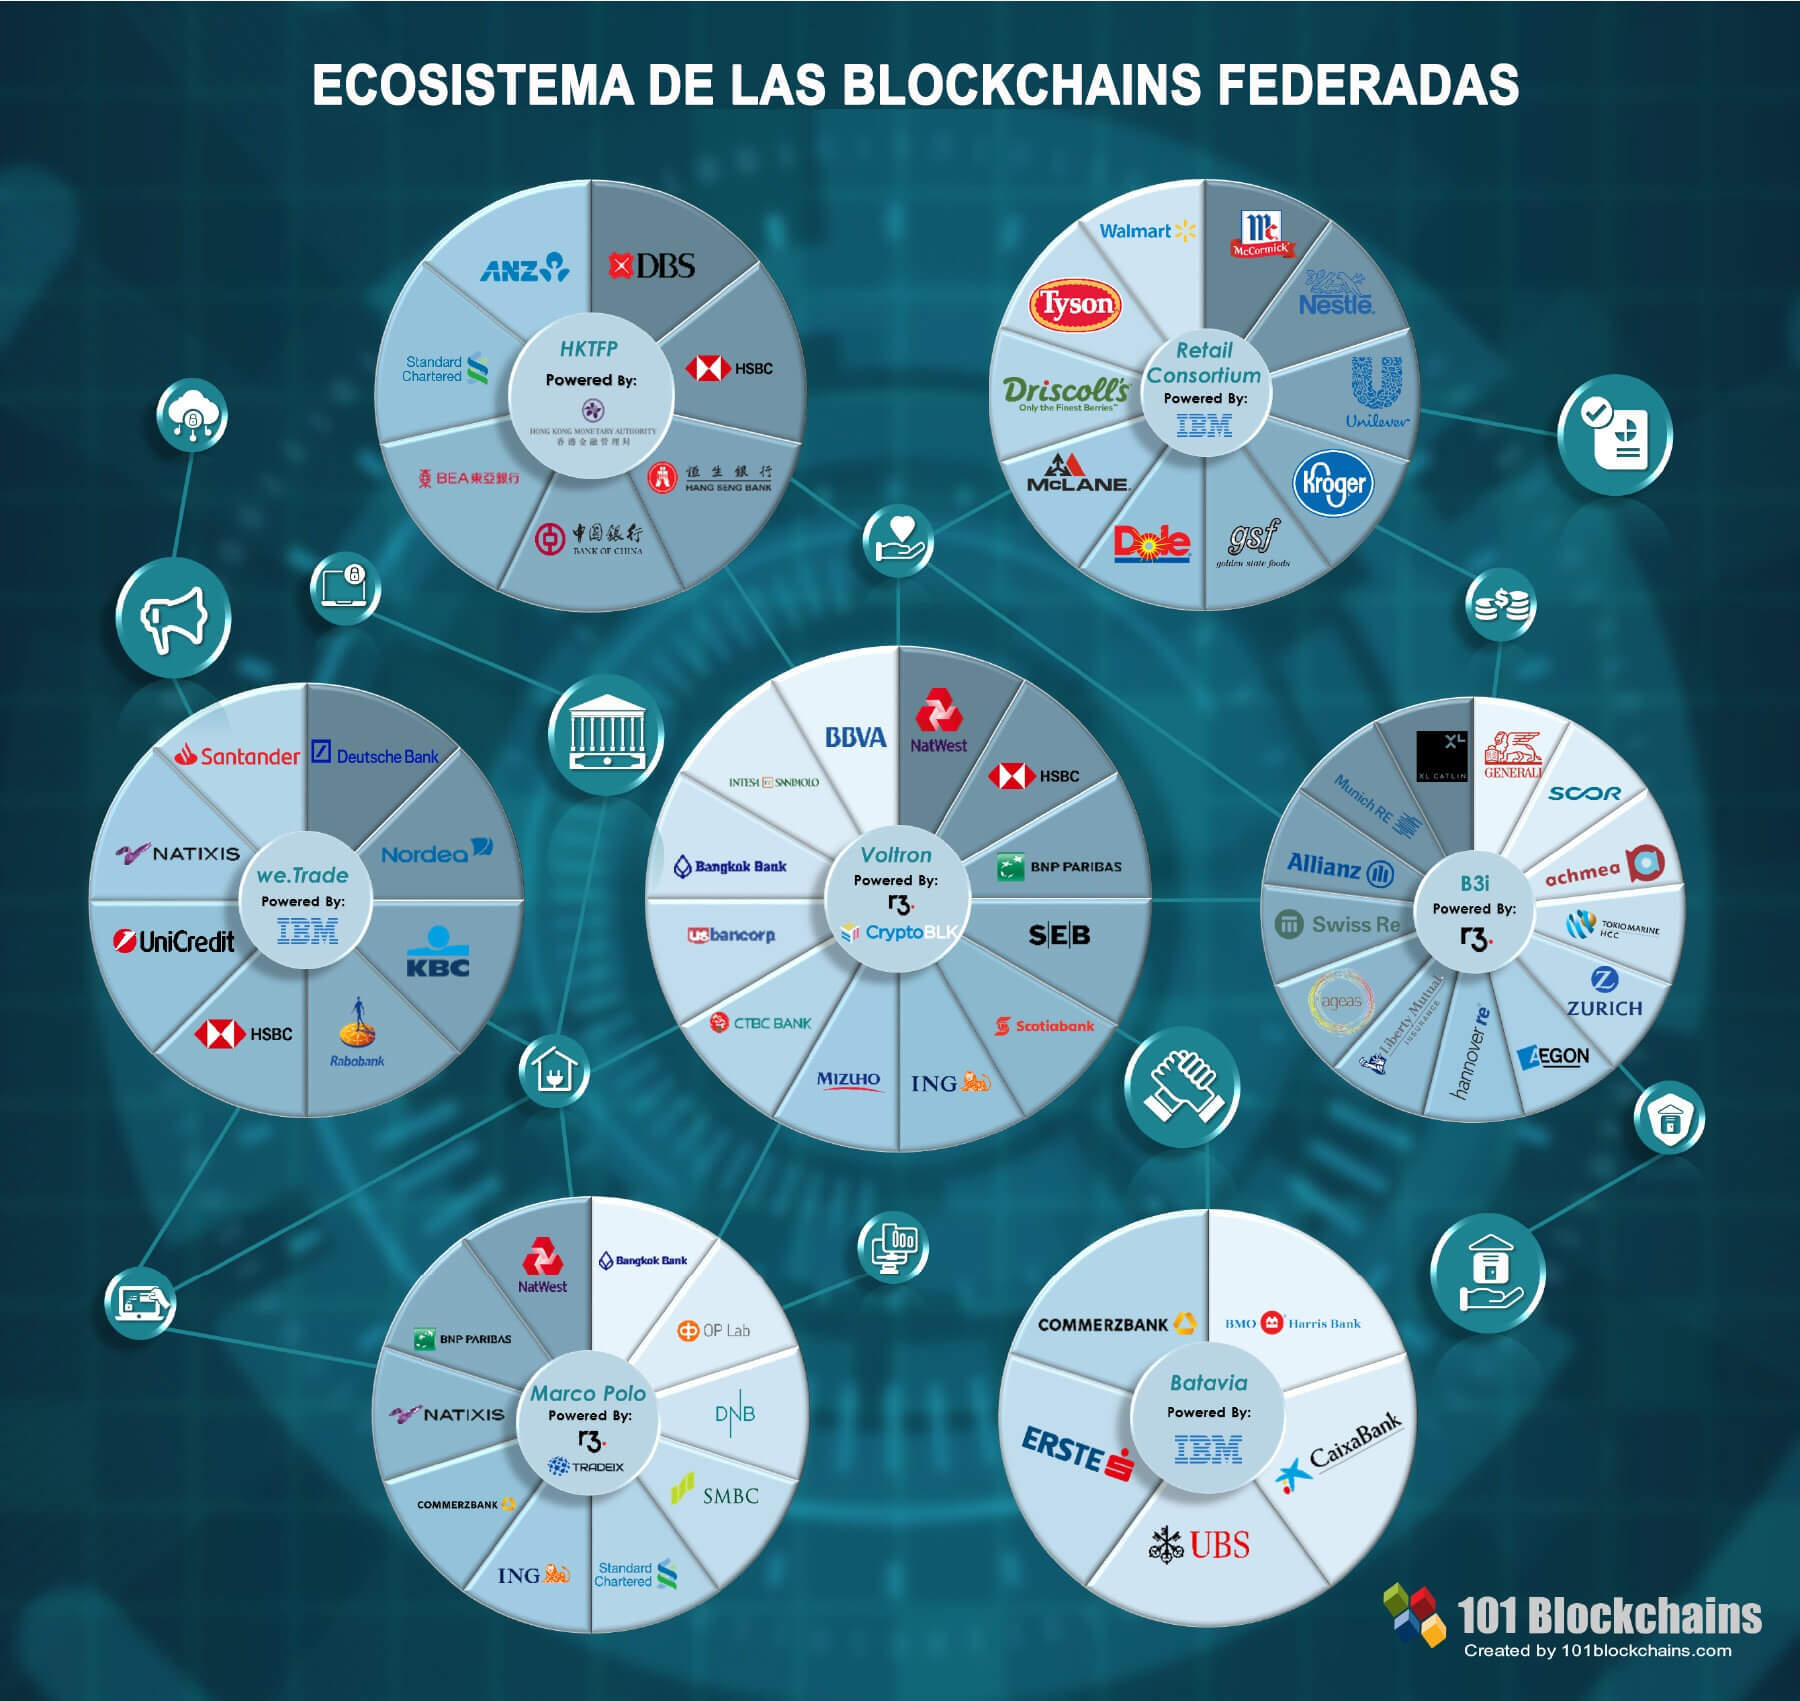 Infografía de ecosistemas de Blockchains Federadas (consorcios de blockchain)